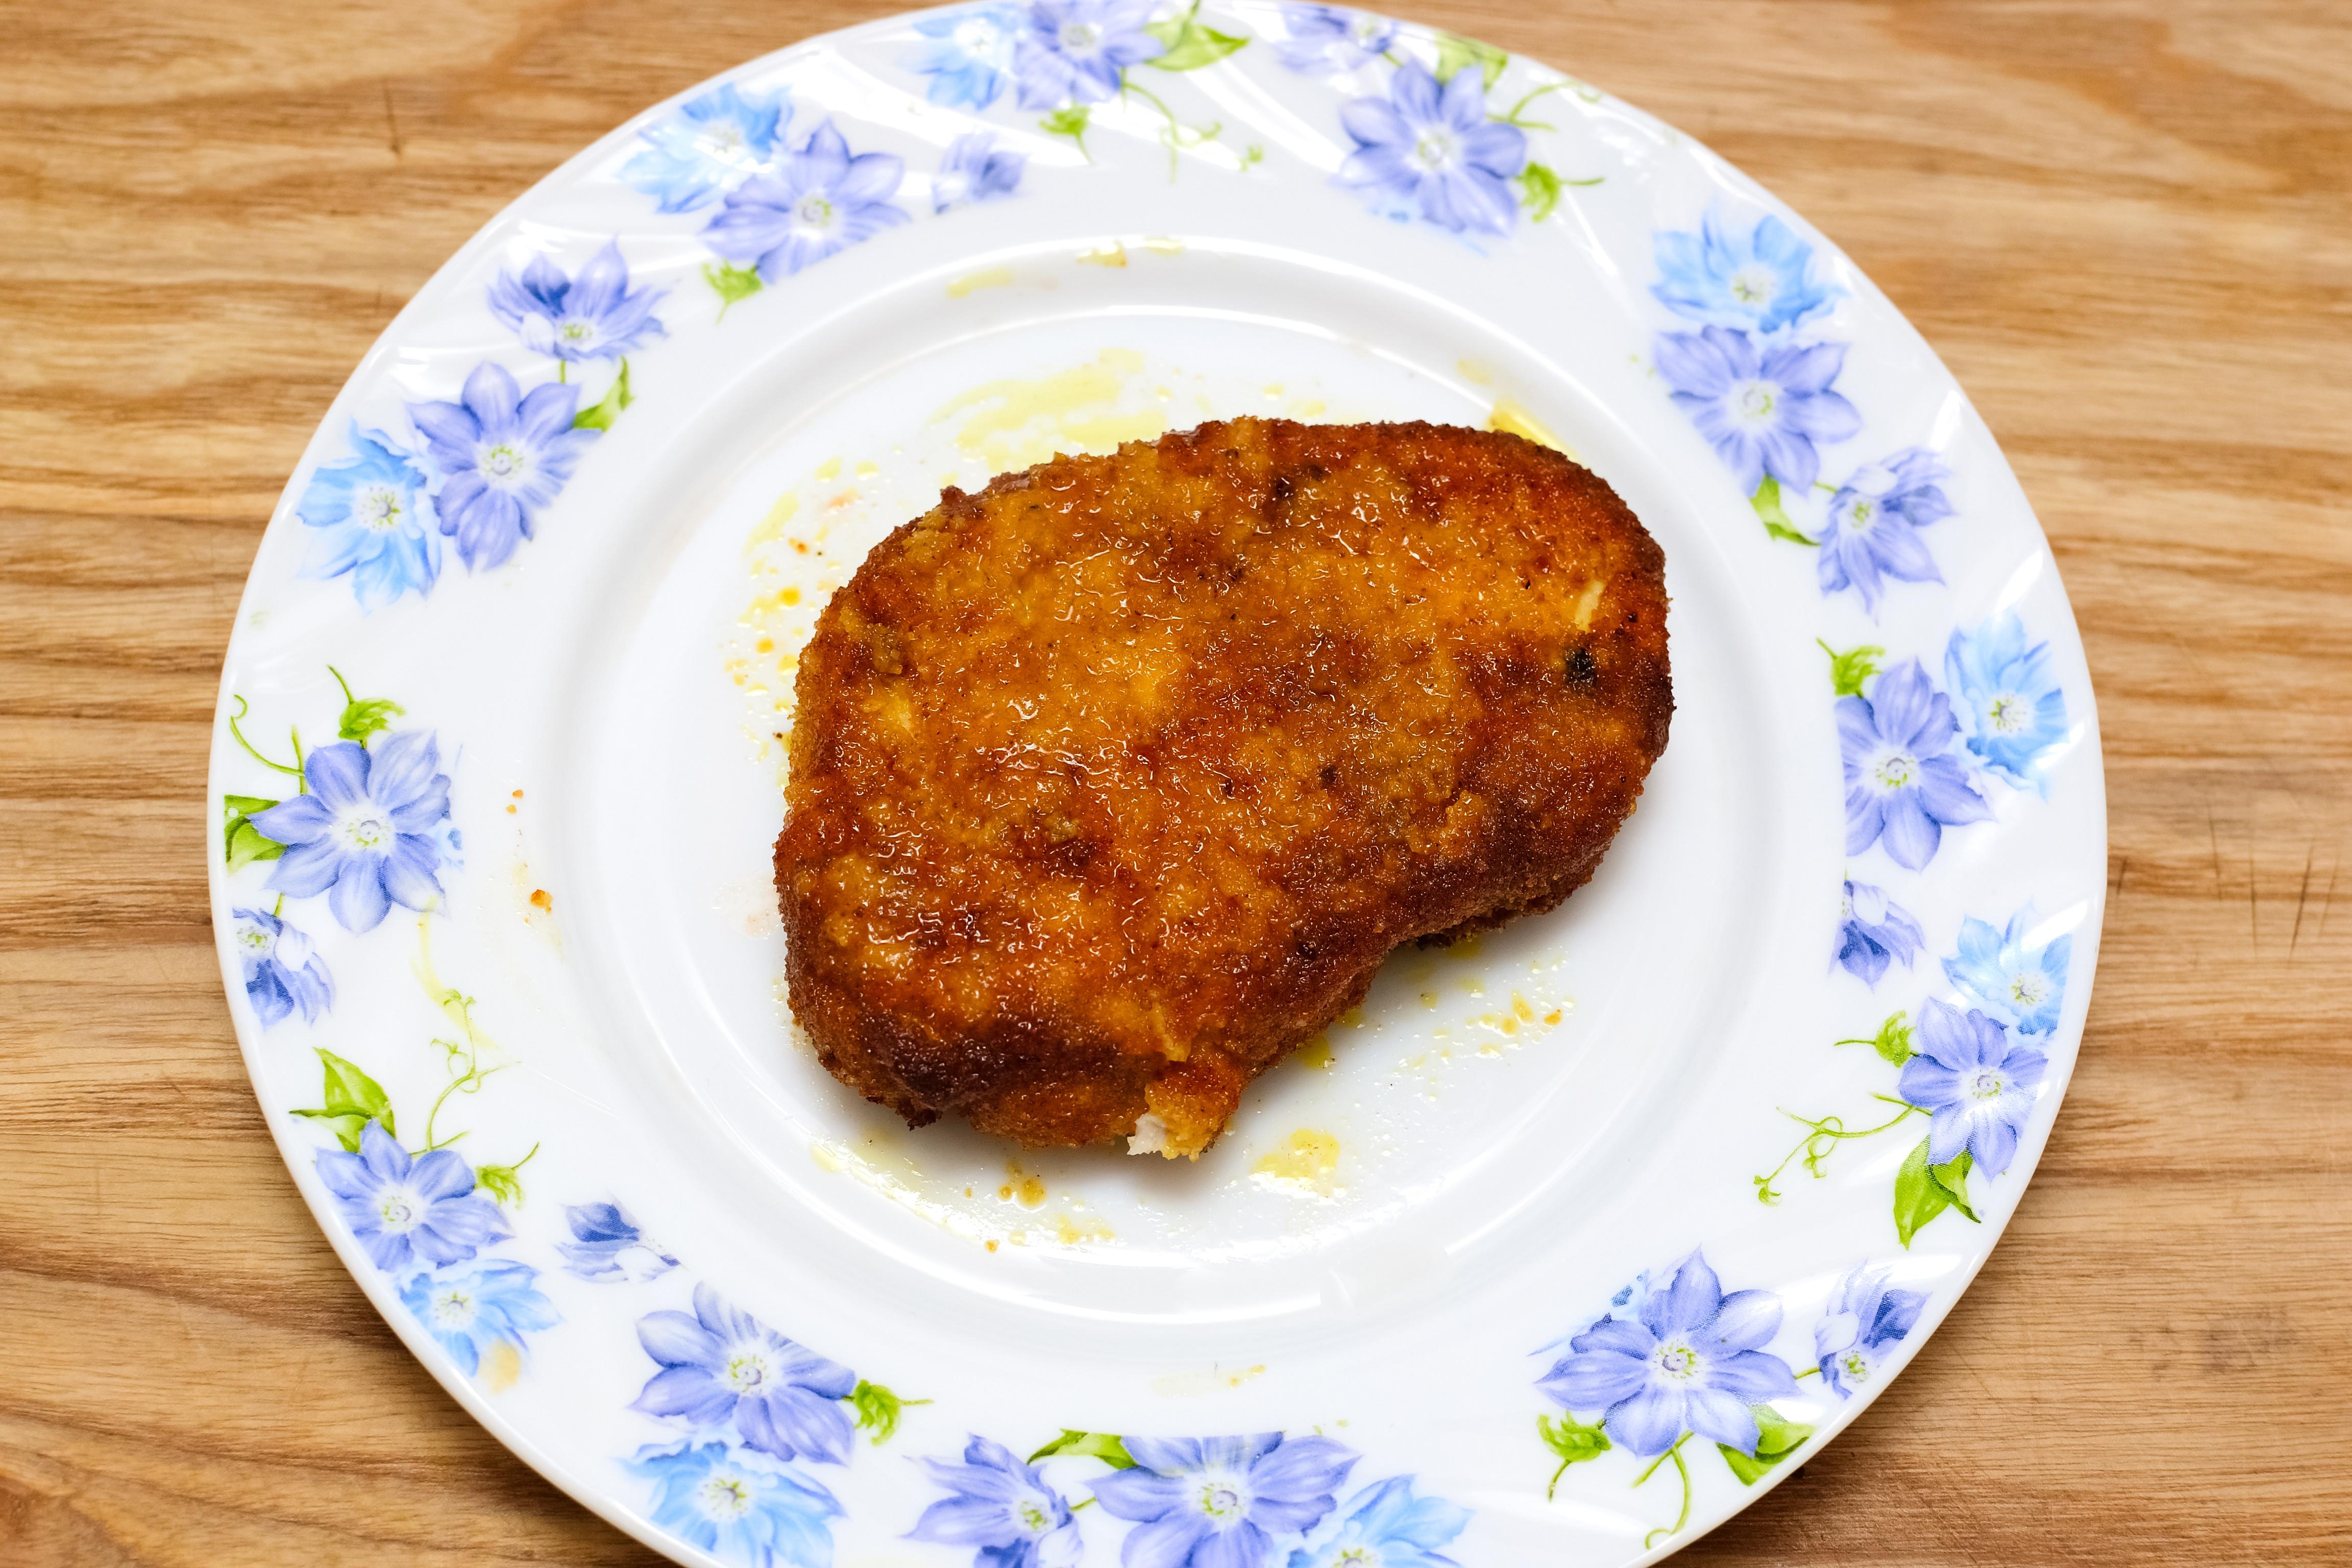 Cooking Boneless Pork Chops  4 Ways to Cook Boneless Pork Chops wikiHow